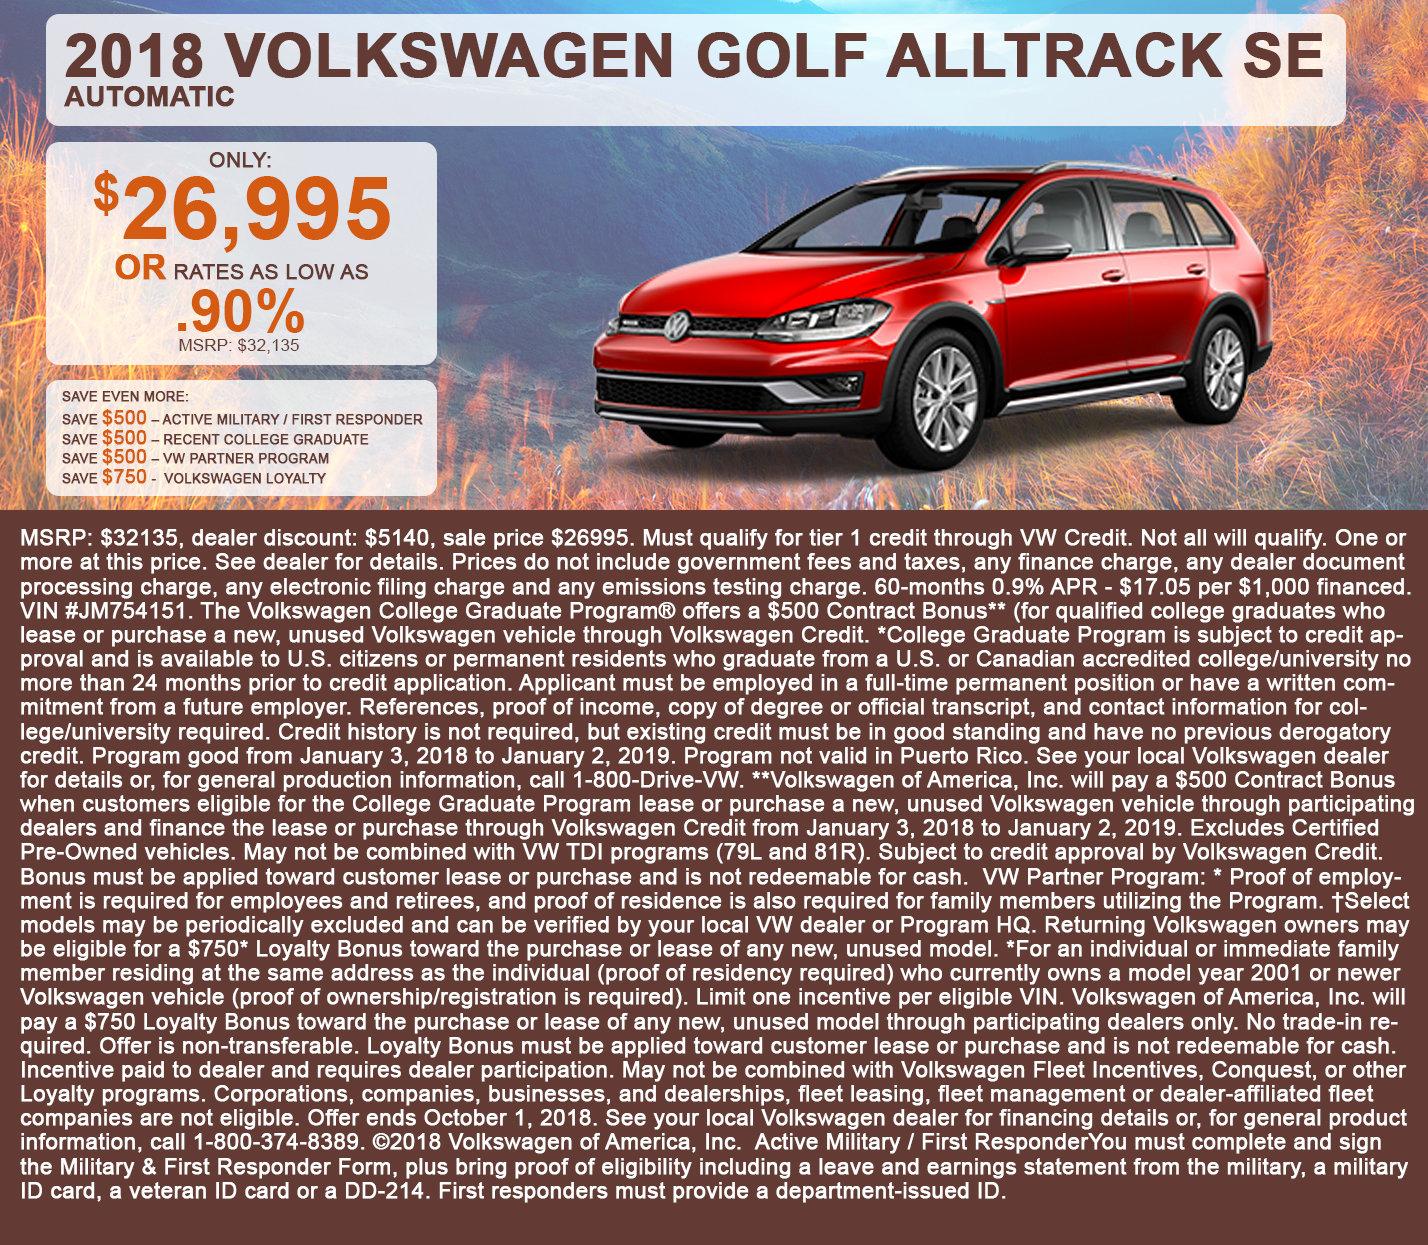 2018 Volkswagen Golf Alltrack SE Automatic